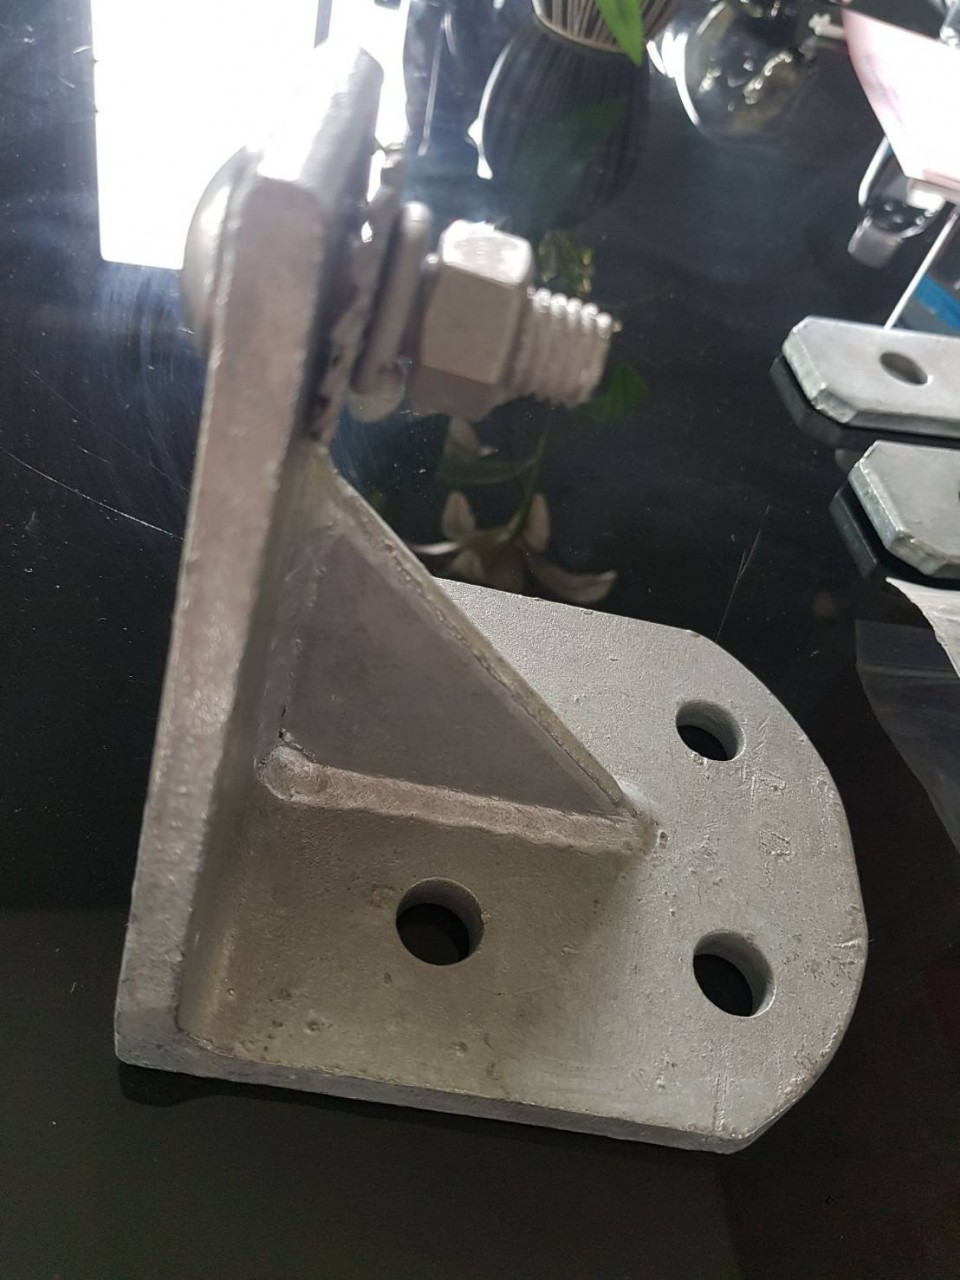 Wongtanawoot___-robot_welding_-robot_automation_1